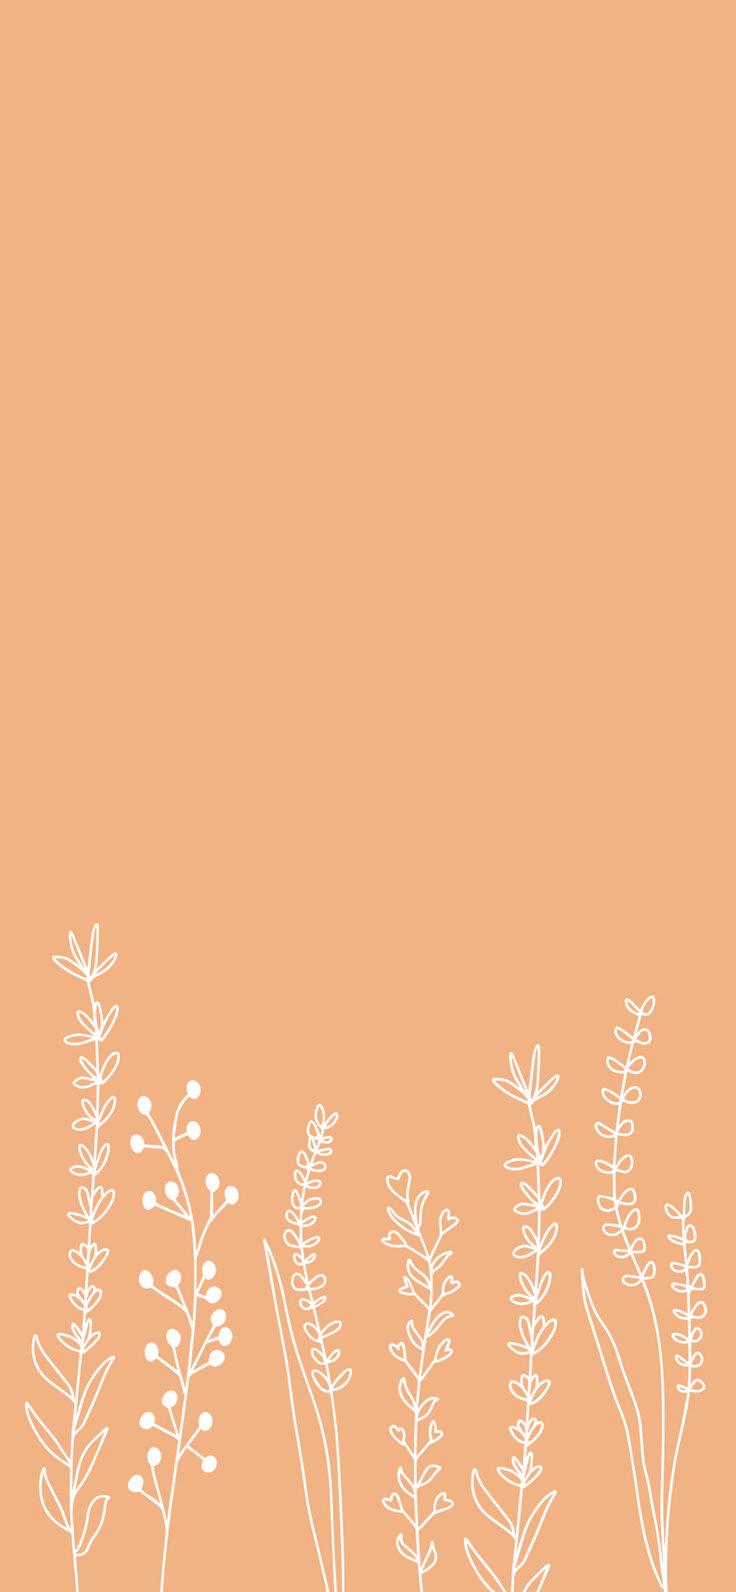 紋理 隱藏 模式 牆紙 背景   Wallpaper dourado, Papel de parede de ouro, Plano de fundo de glitter